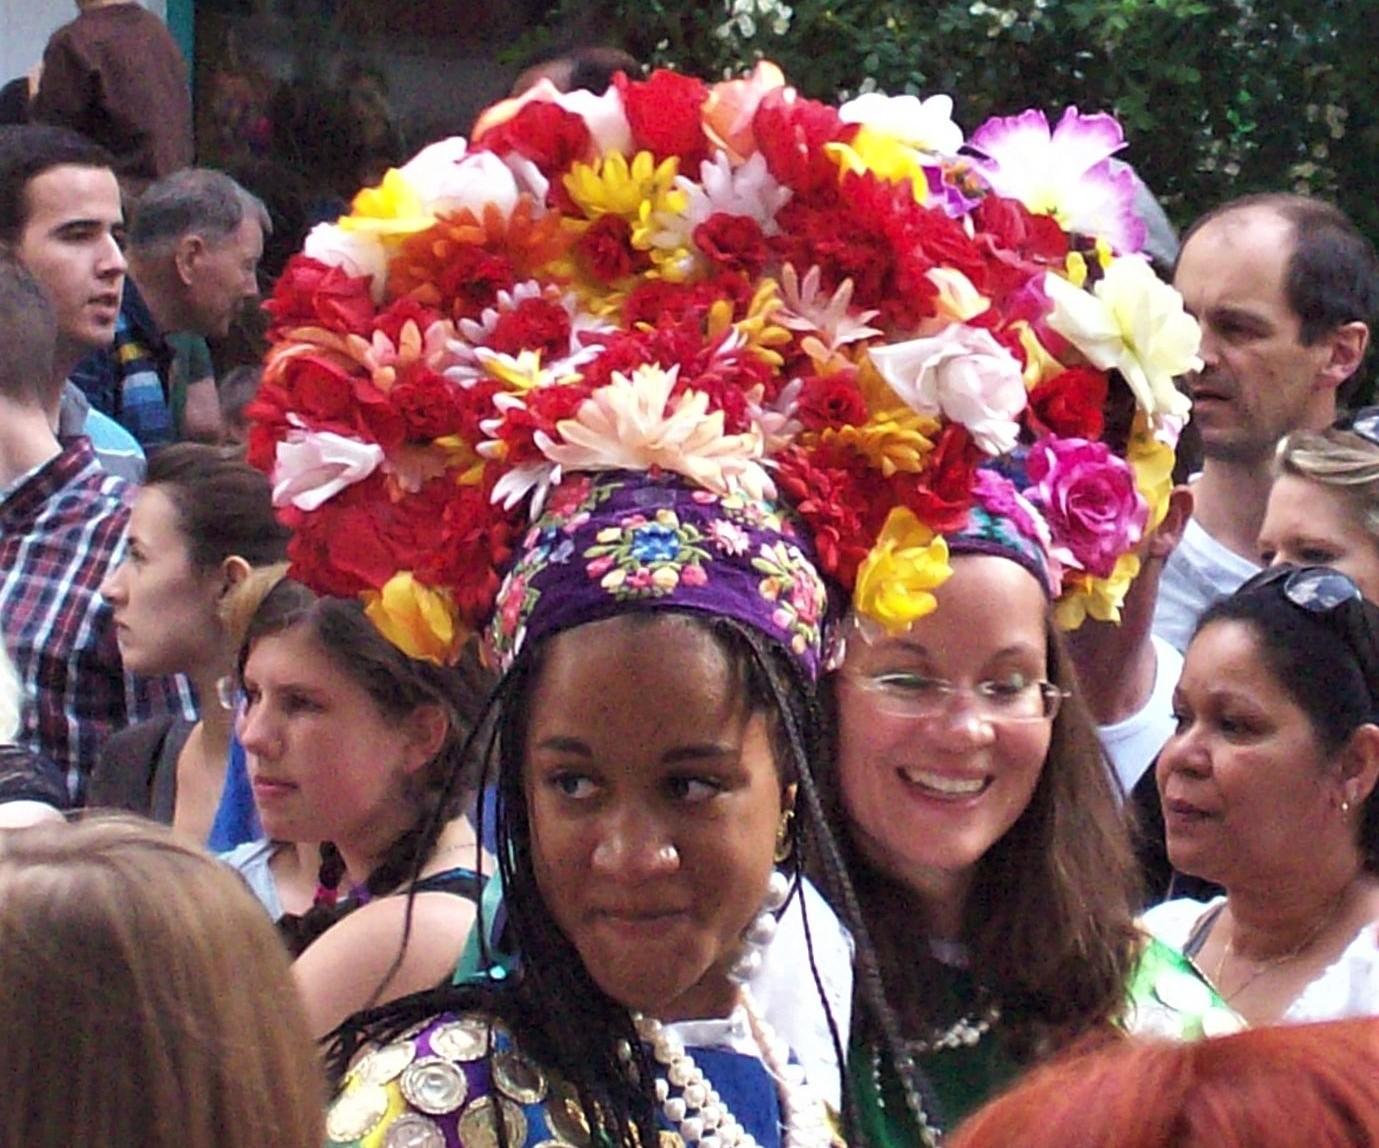 Karneval der Kulturen in Kreuzberg